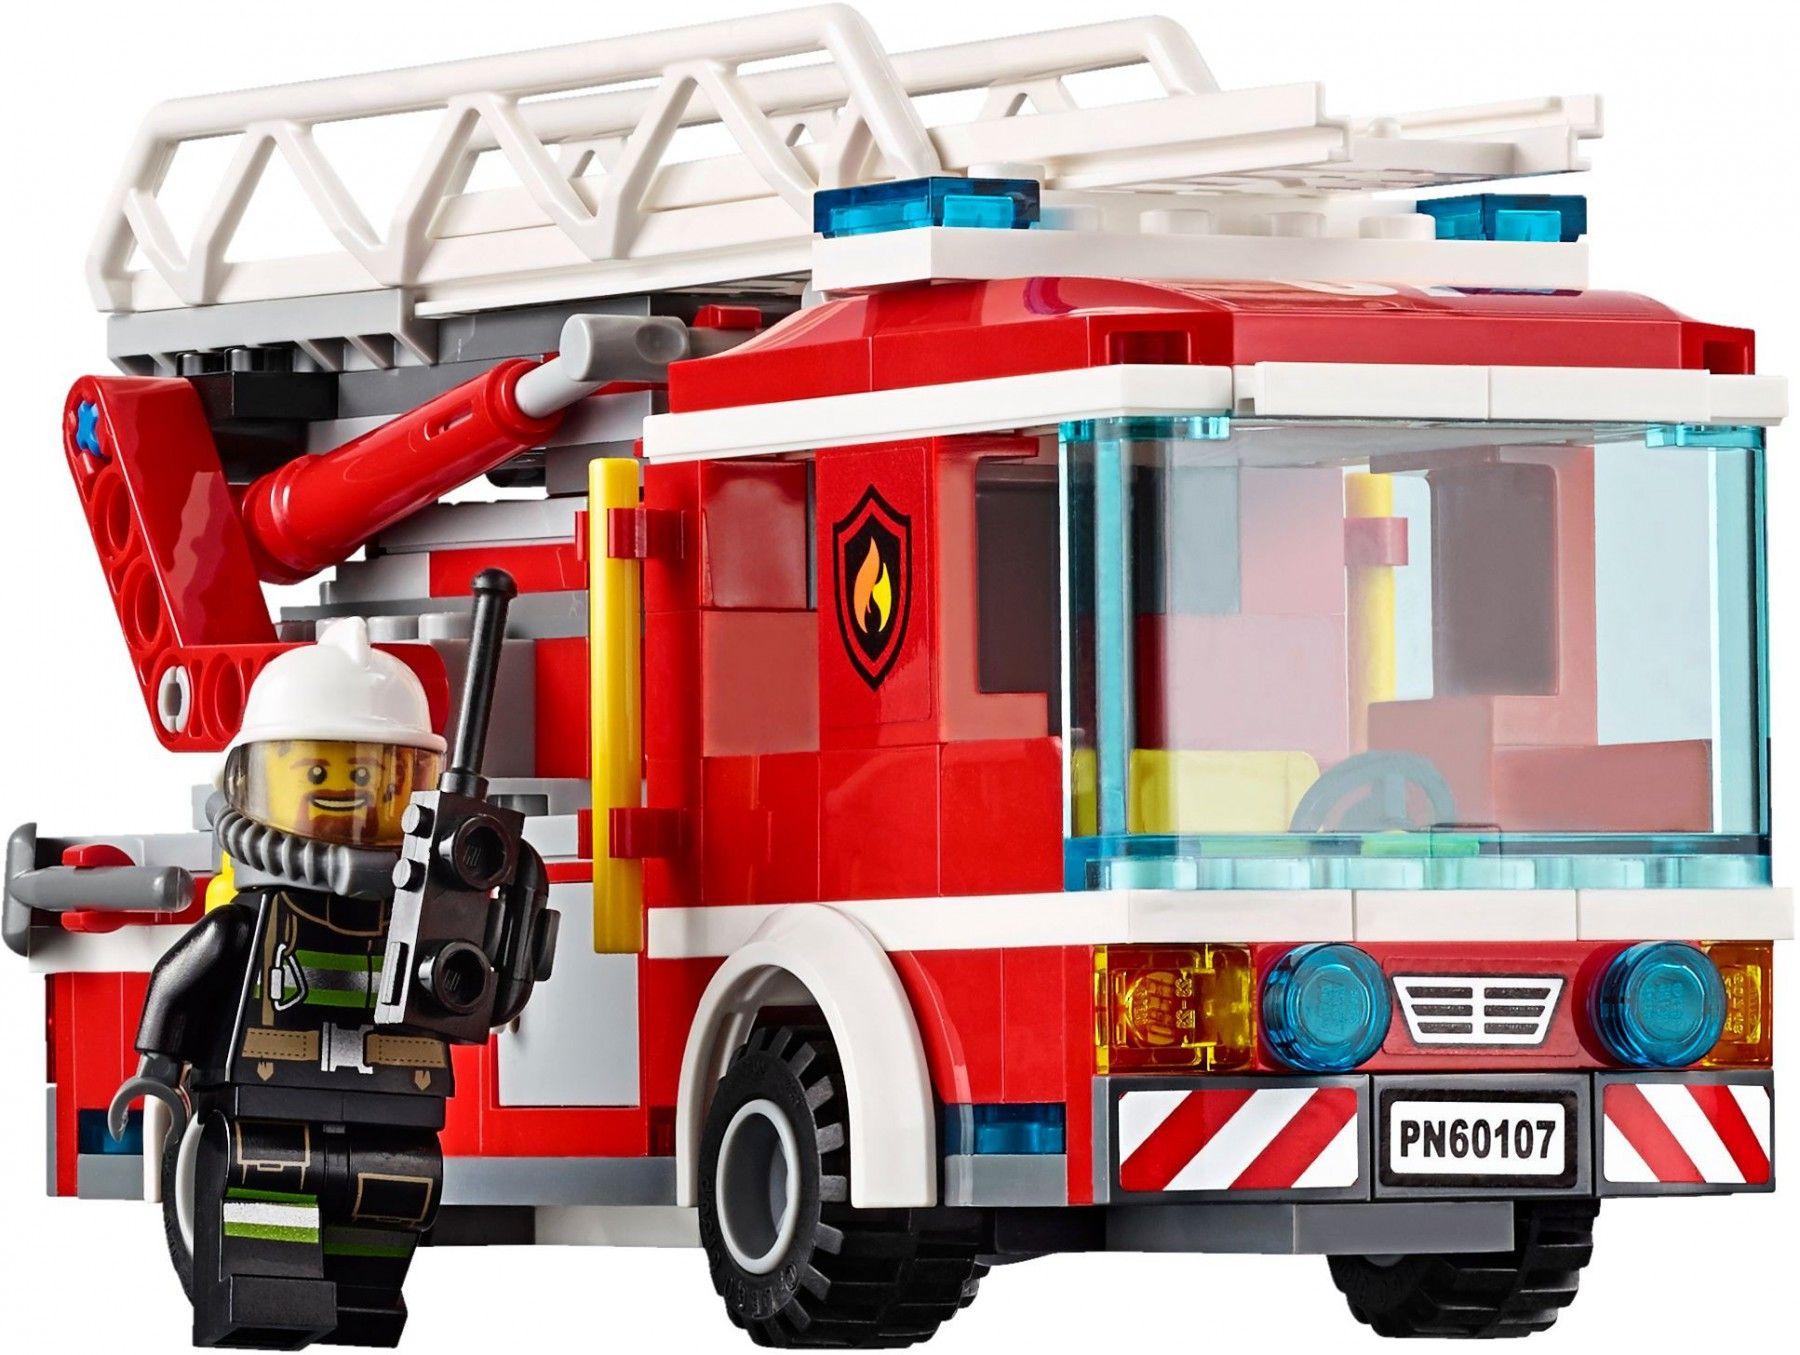 Lego City Brandweer Ladderwagen 60107 Lego City Lego Brandweer